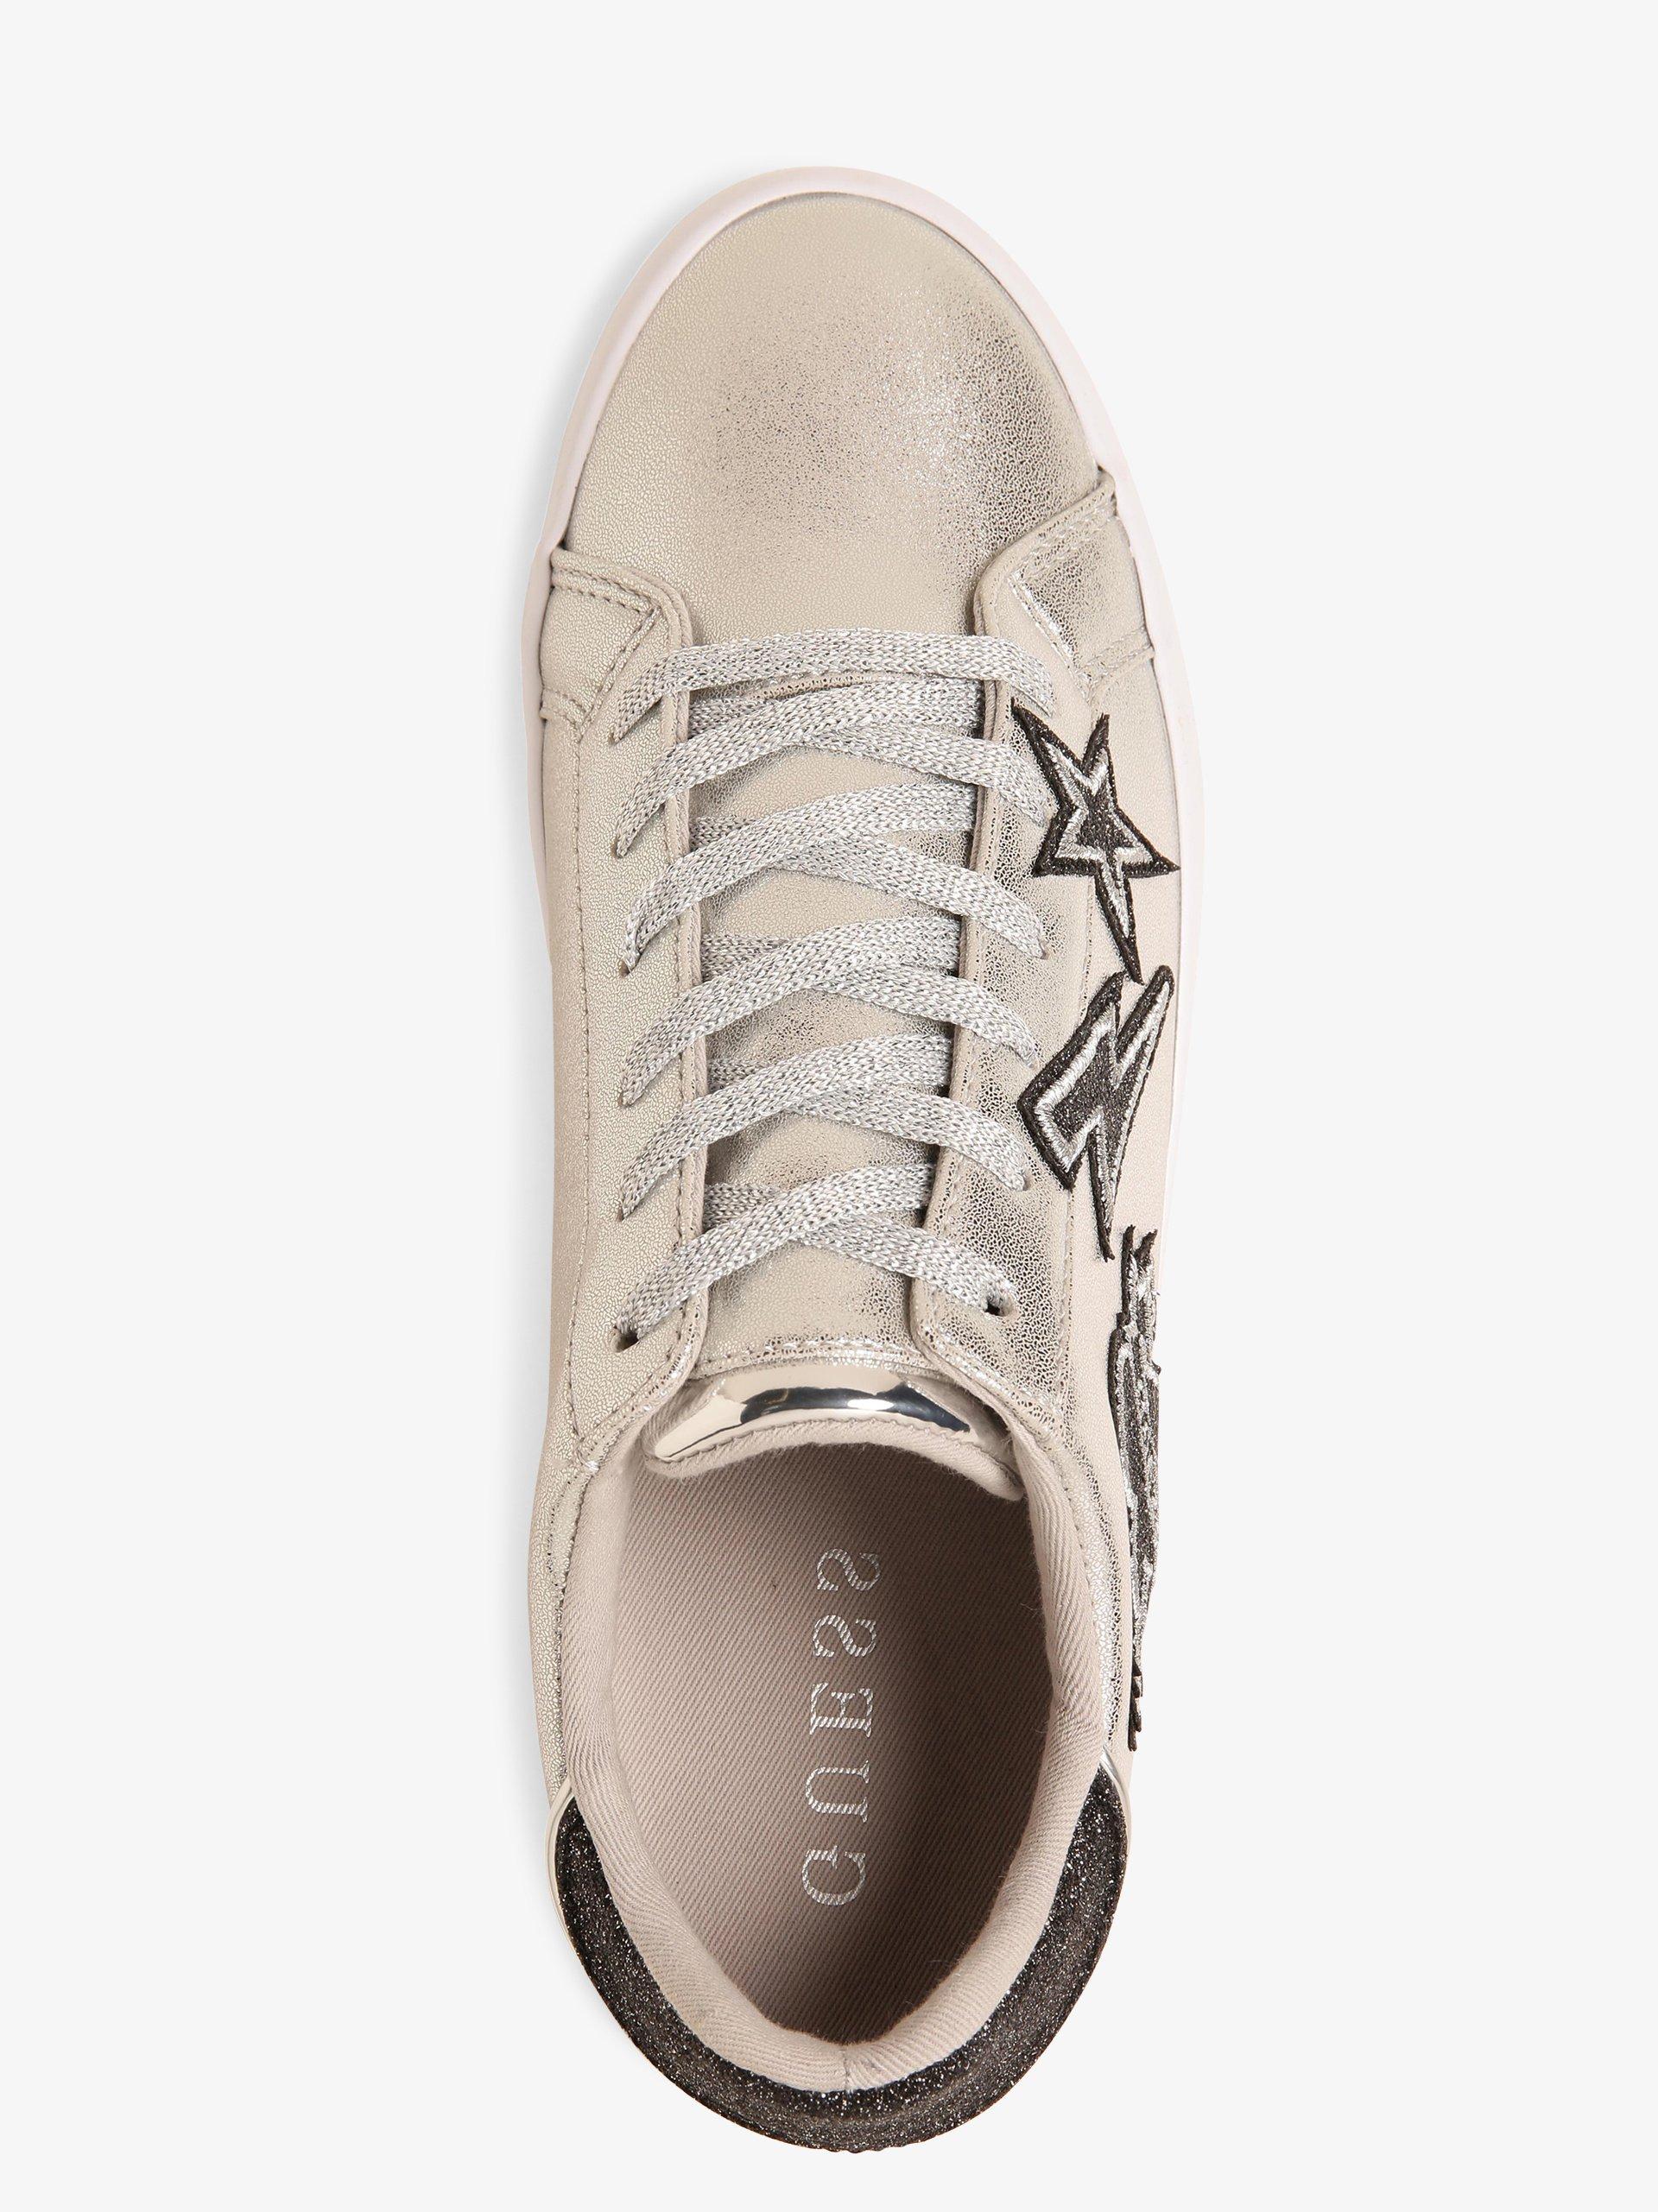 Guess Jeans Tenisówki damskie